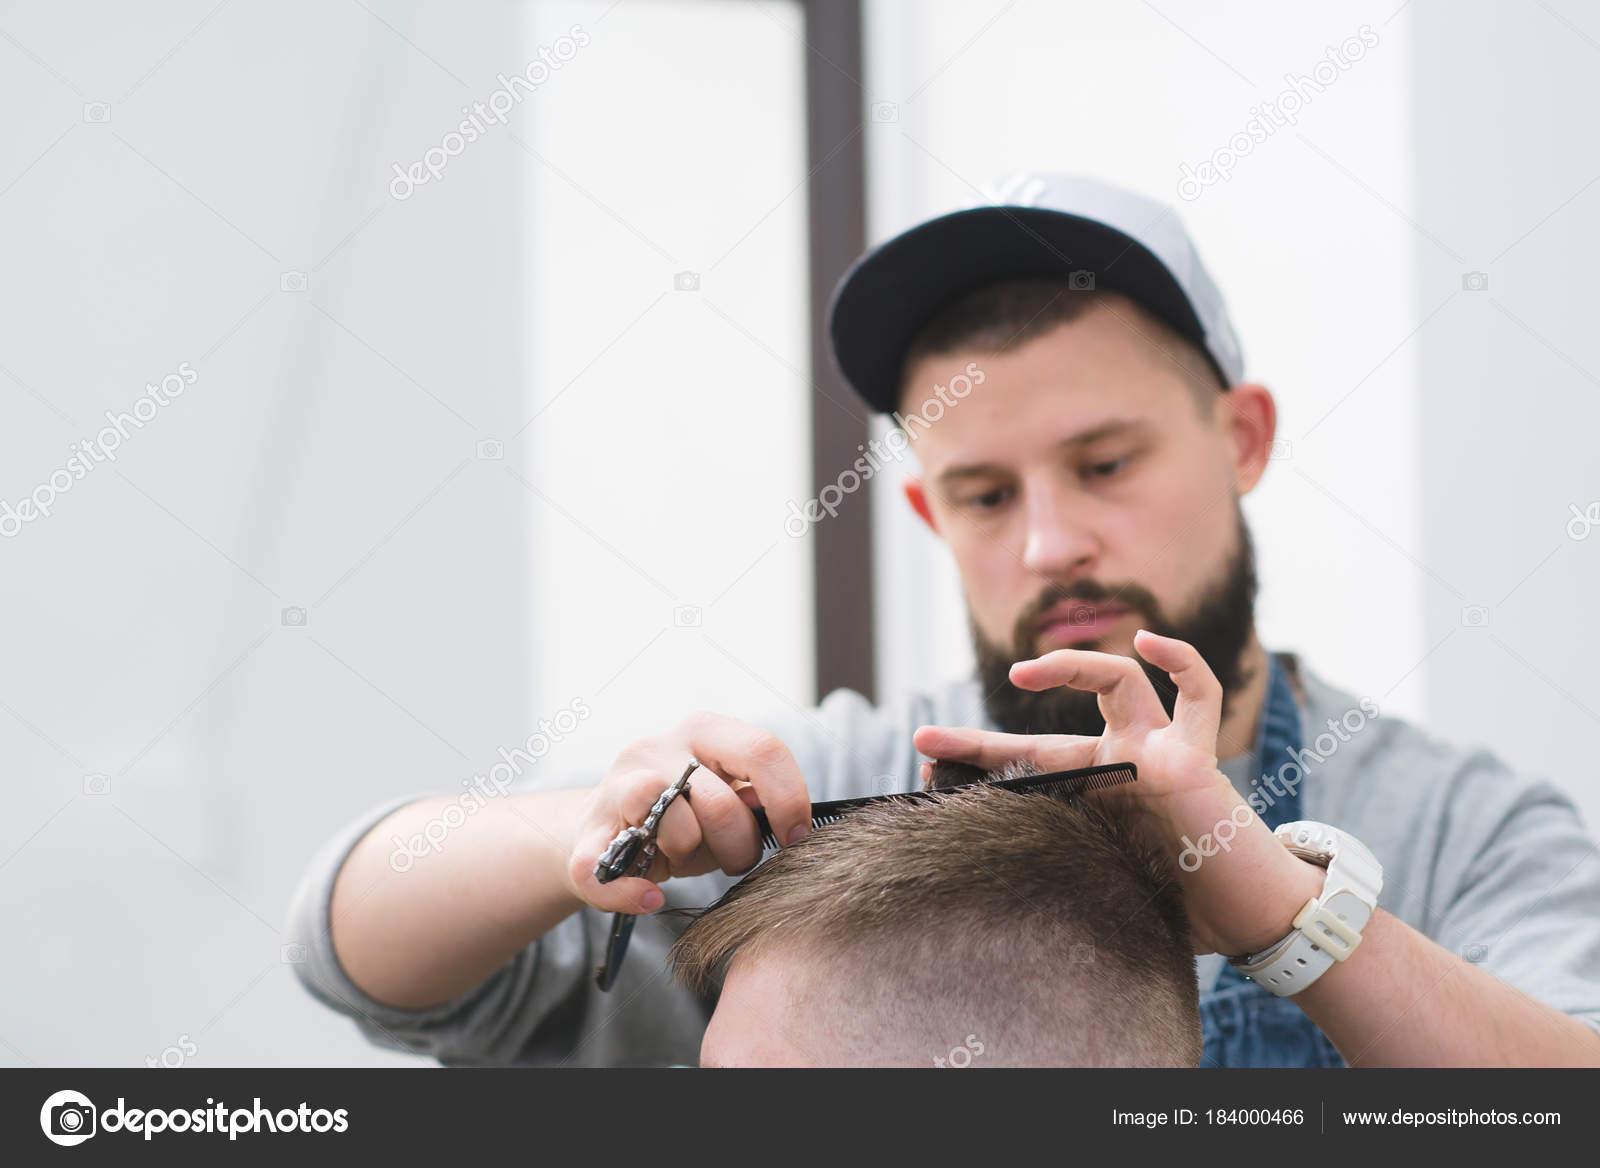 Mens Haircut In Barbershop Master Barber Creates A Stylish Male